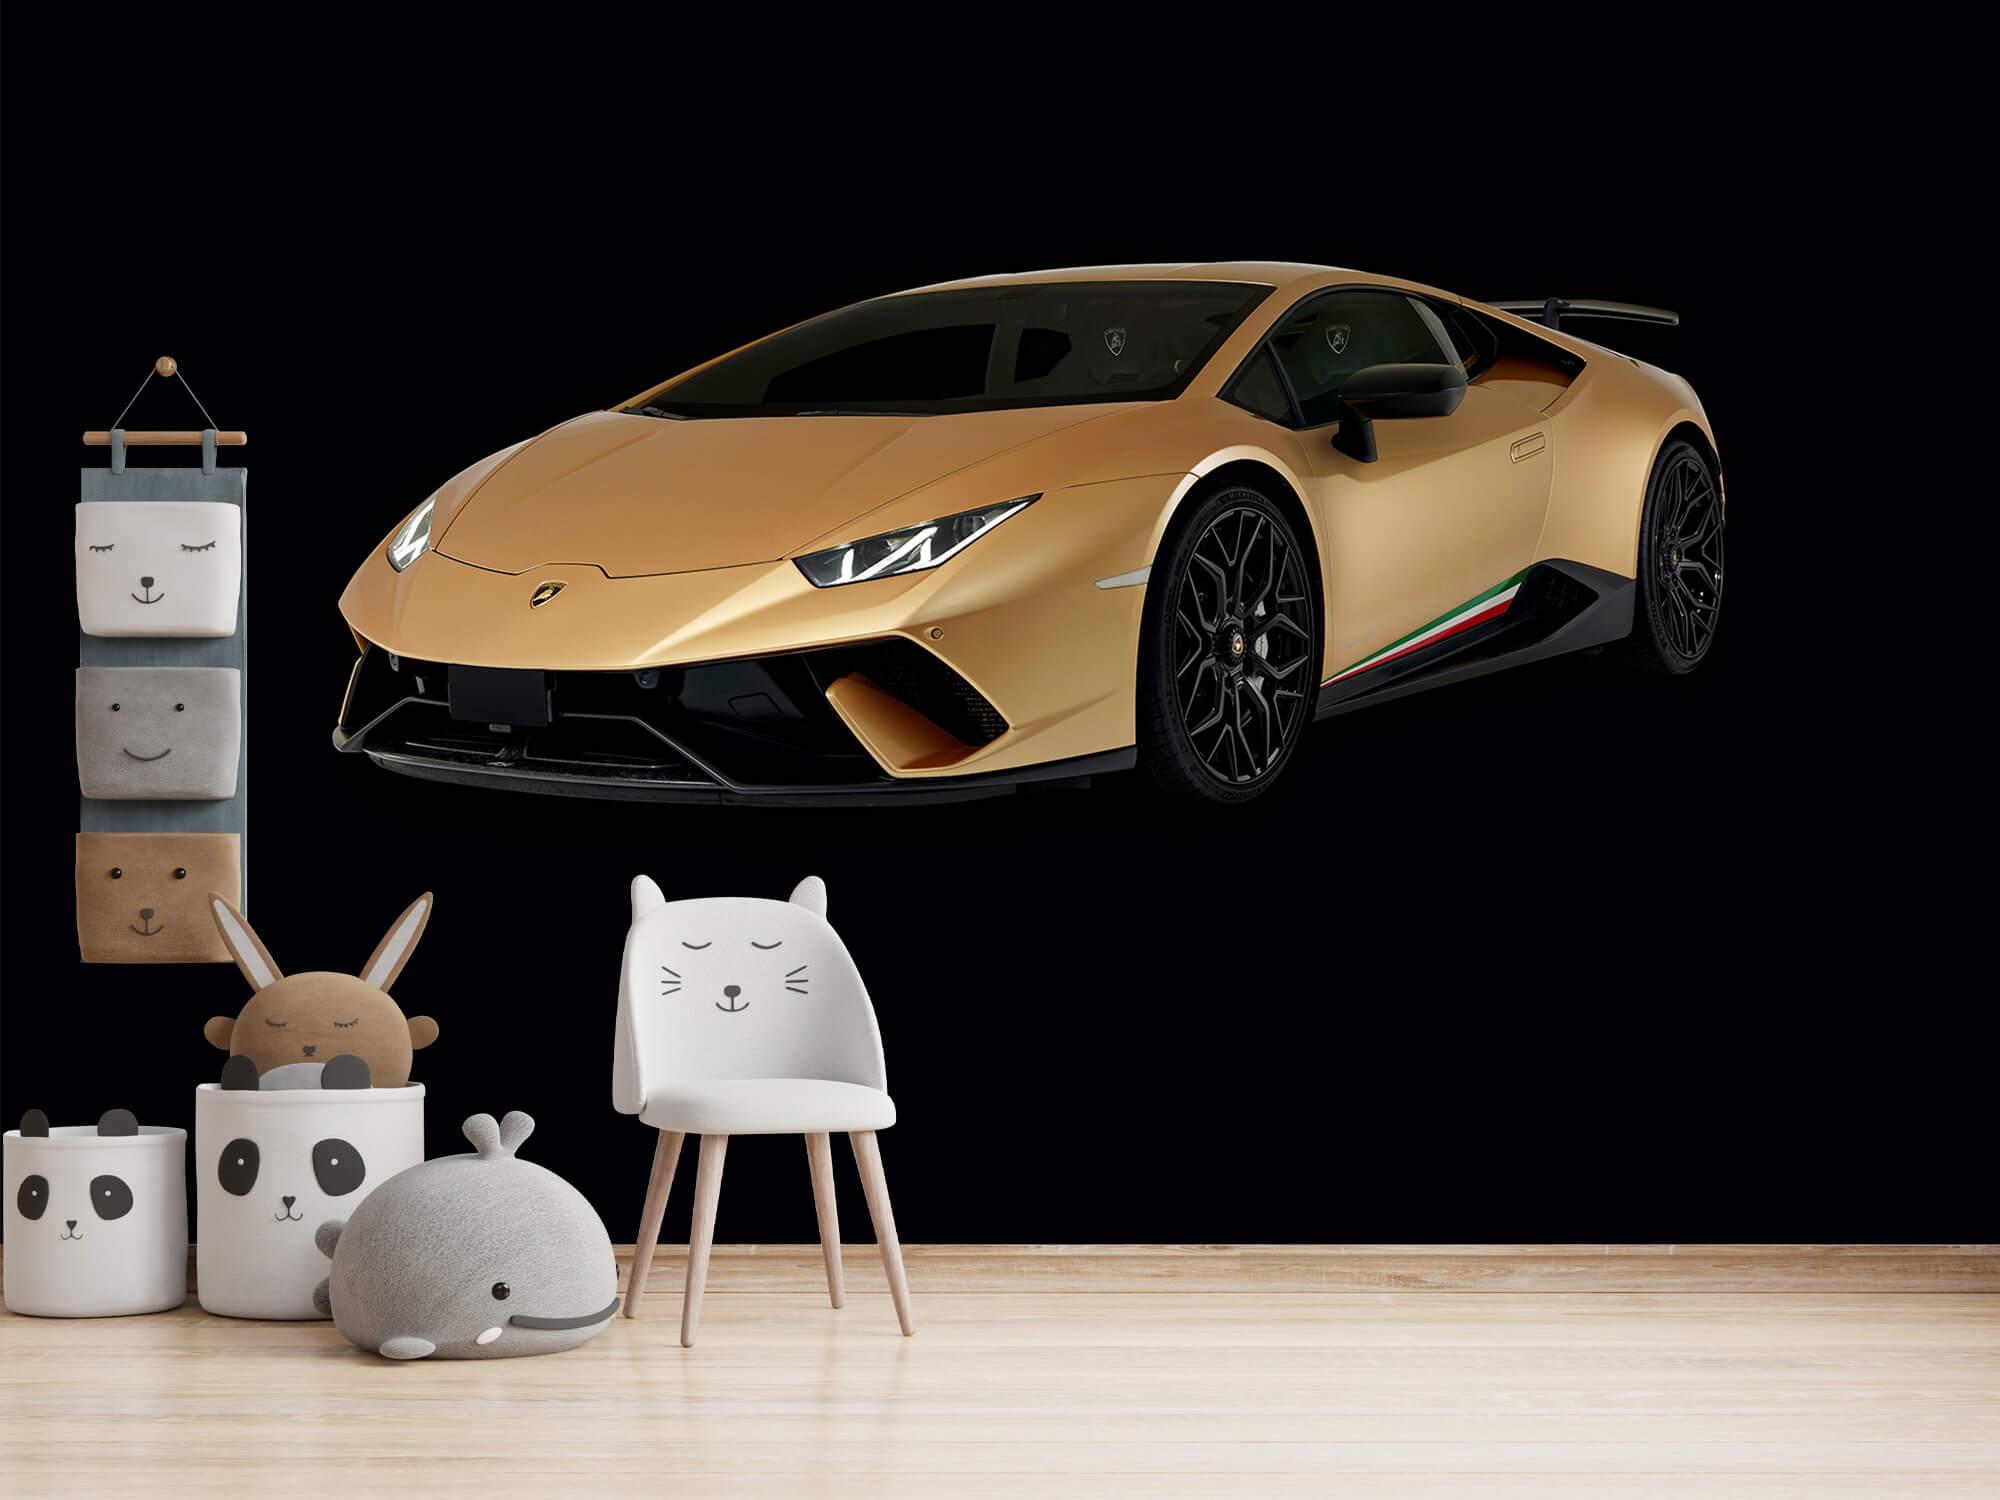 Wallpaper Lamborghini Huracán - Avant droit, noir 14